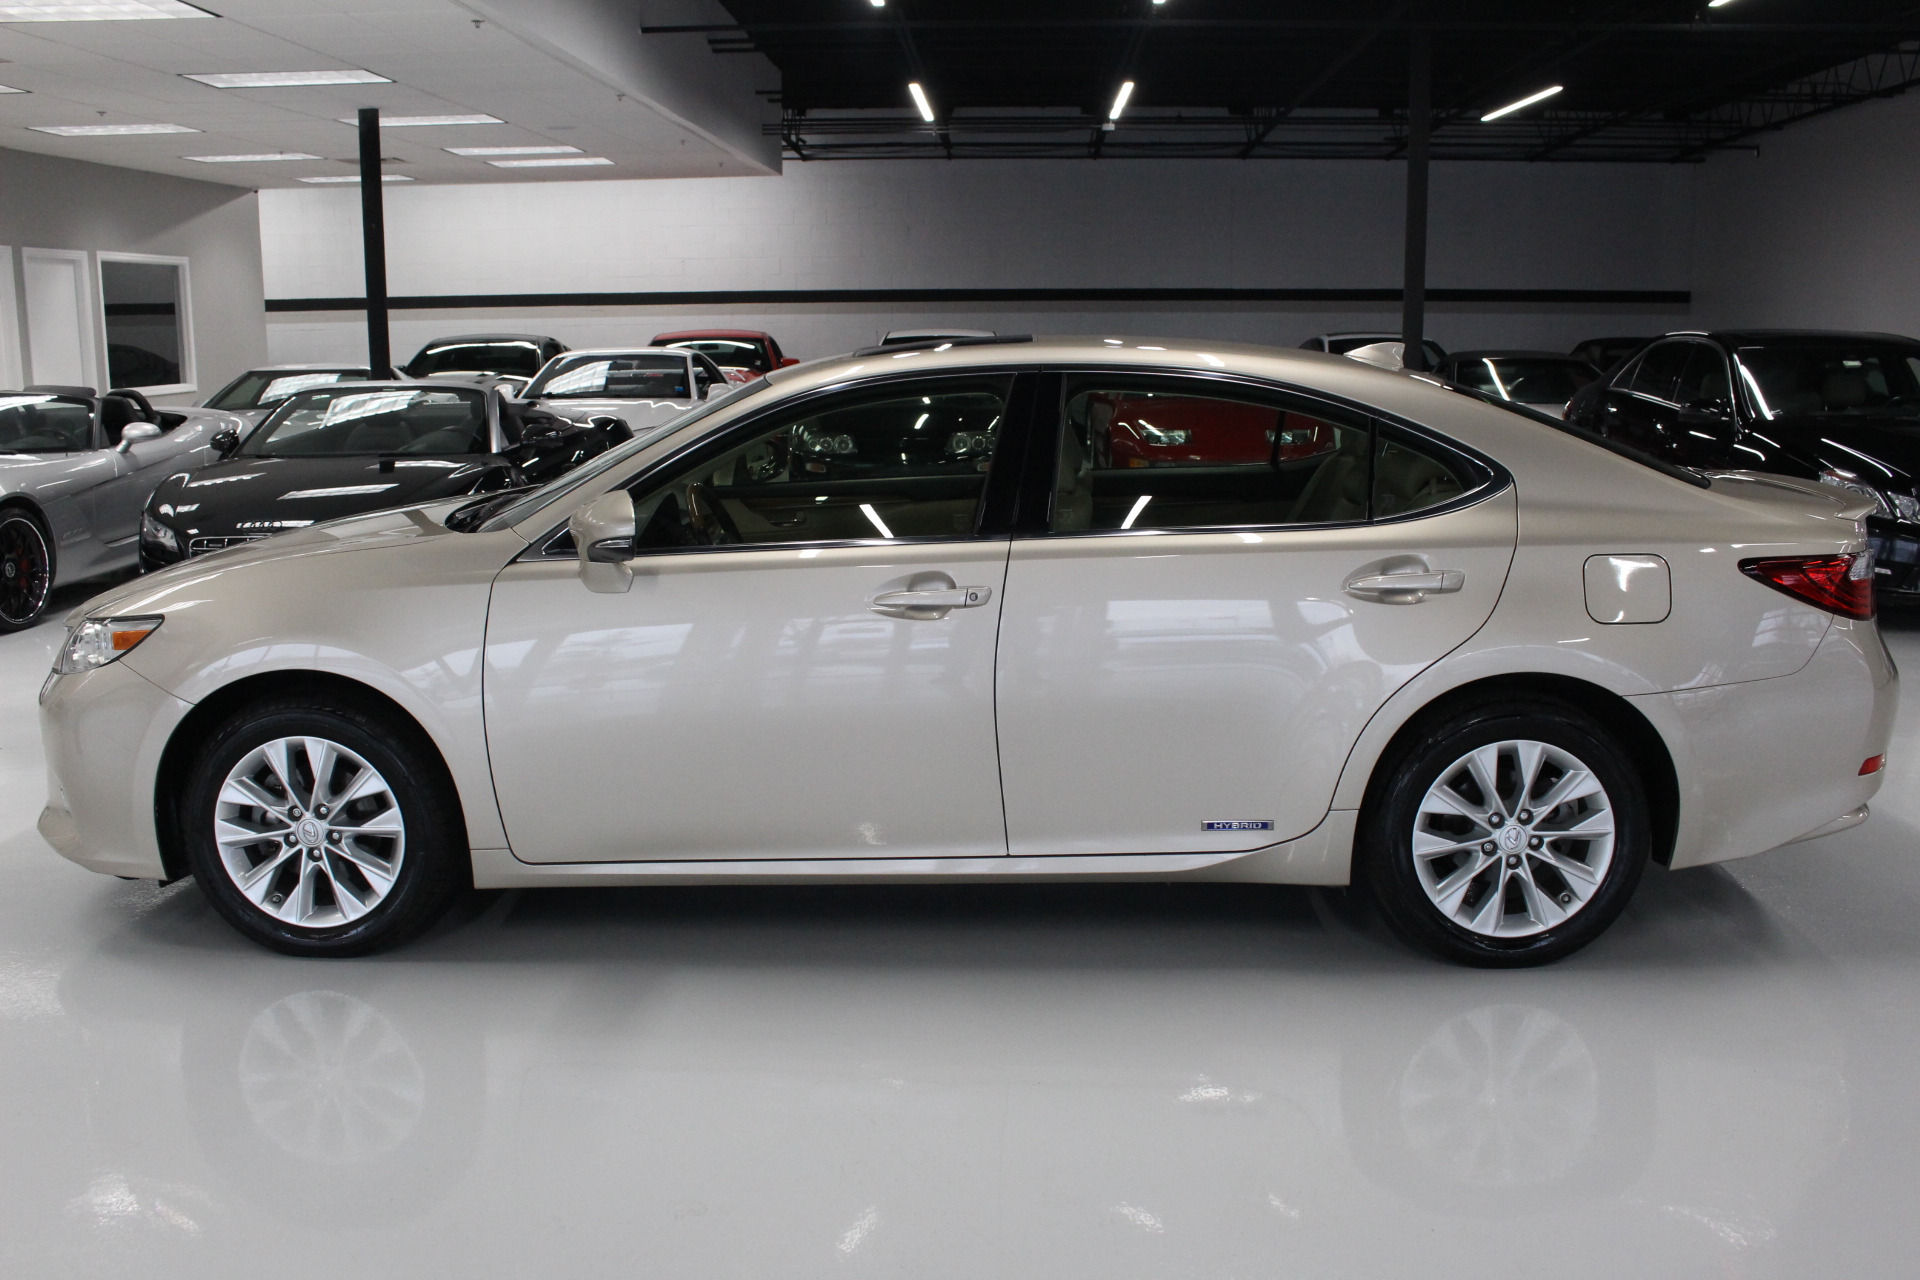 Hendrick Lexus Lexus Kansas City Dealership New Lexus | Autos Post